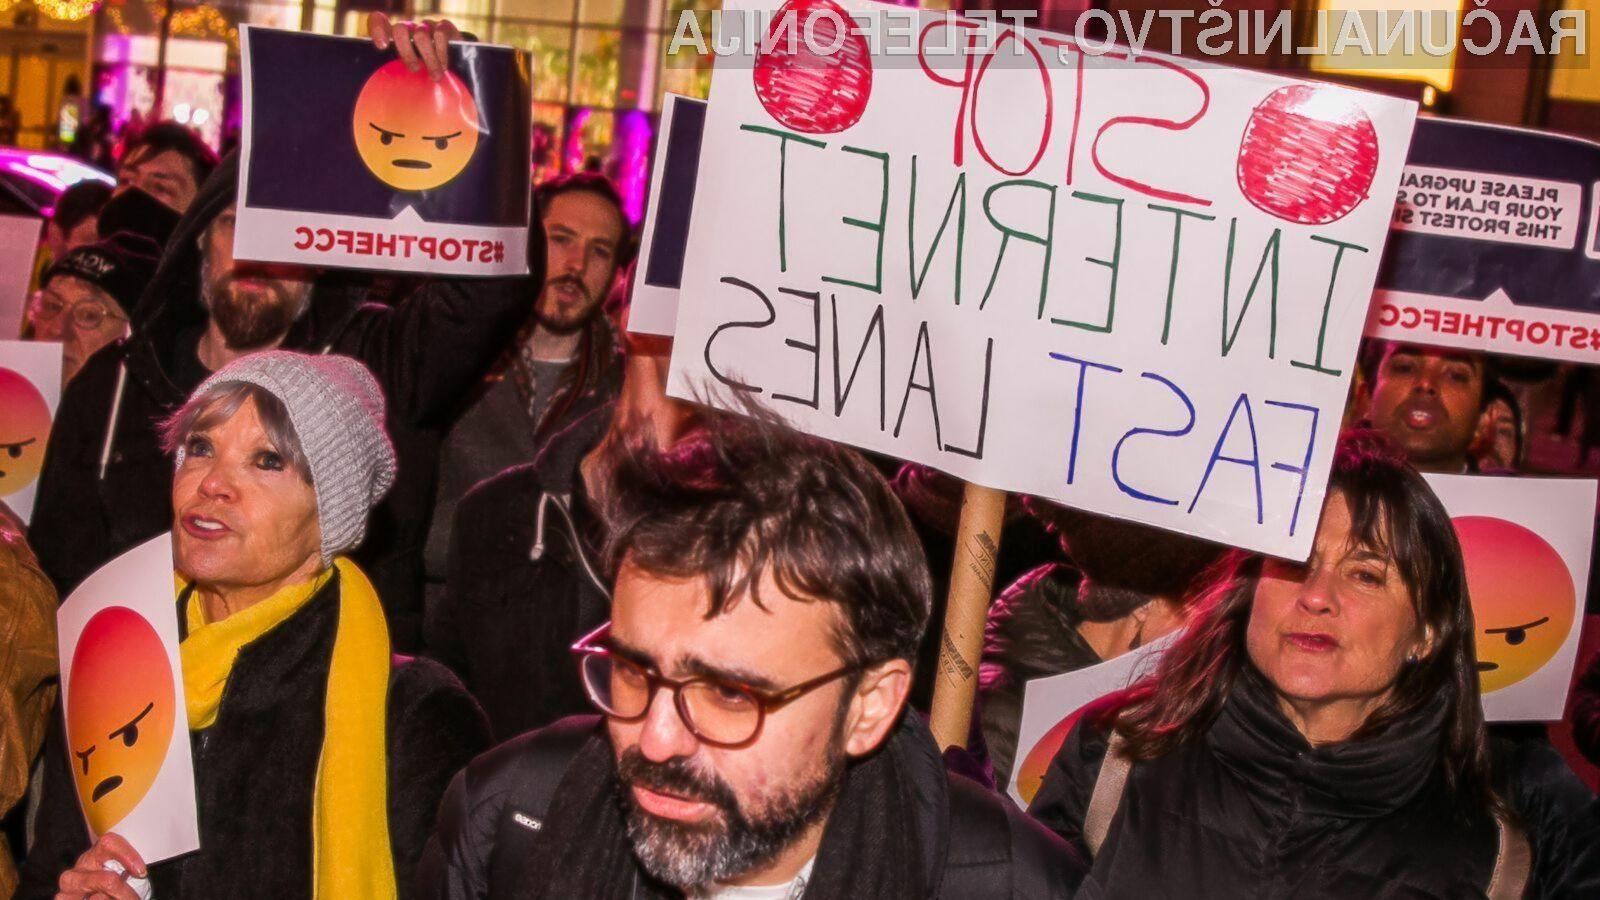 Odprt internet stvar preteklosti?